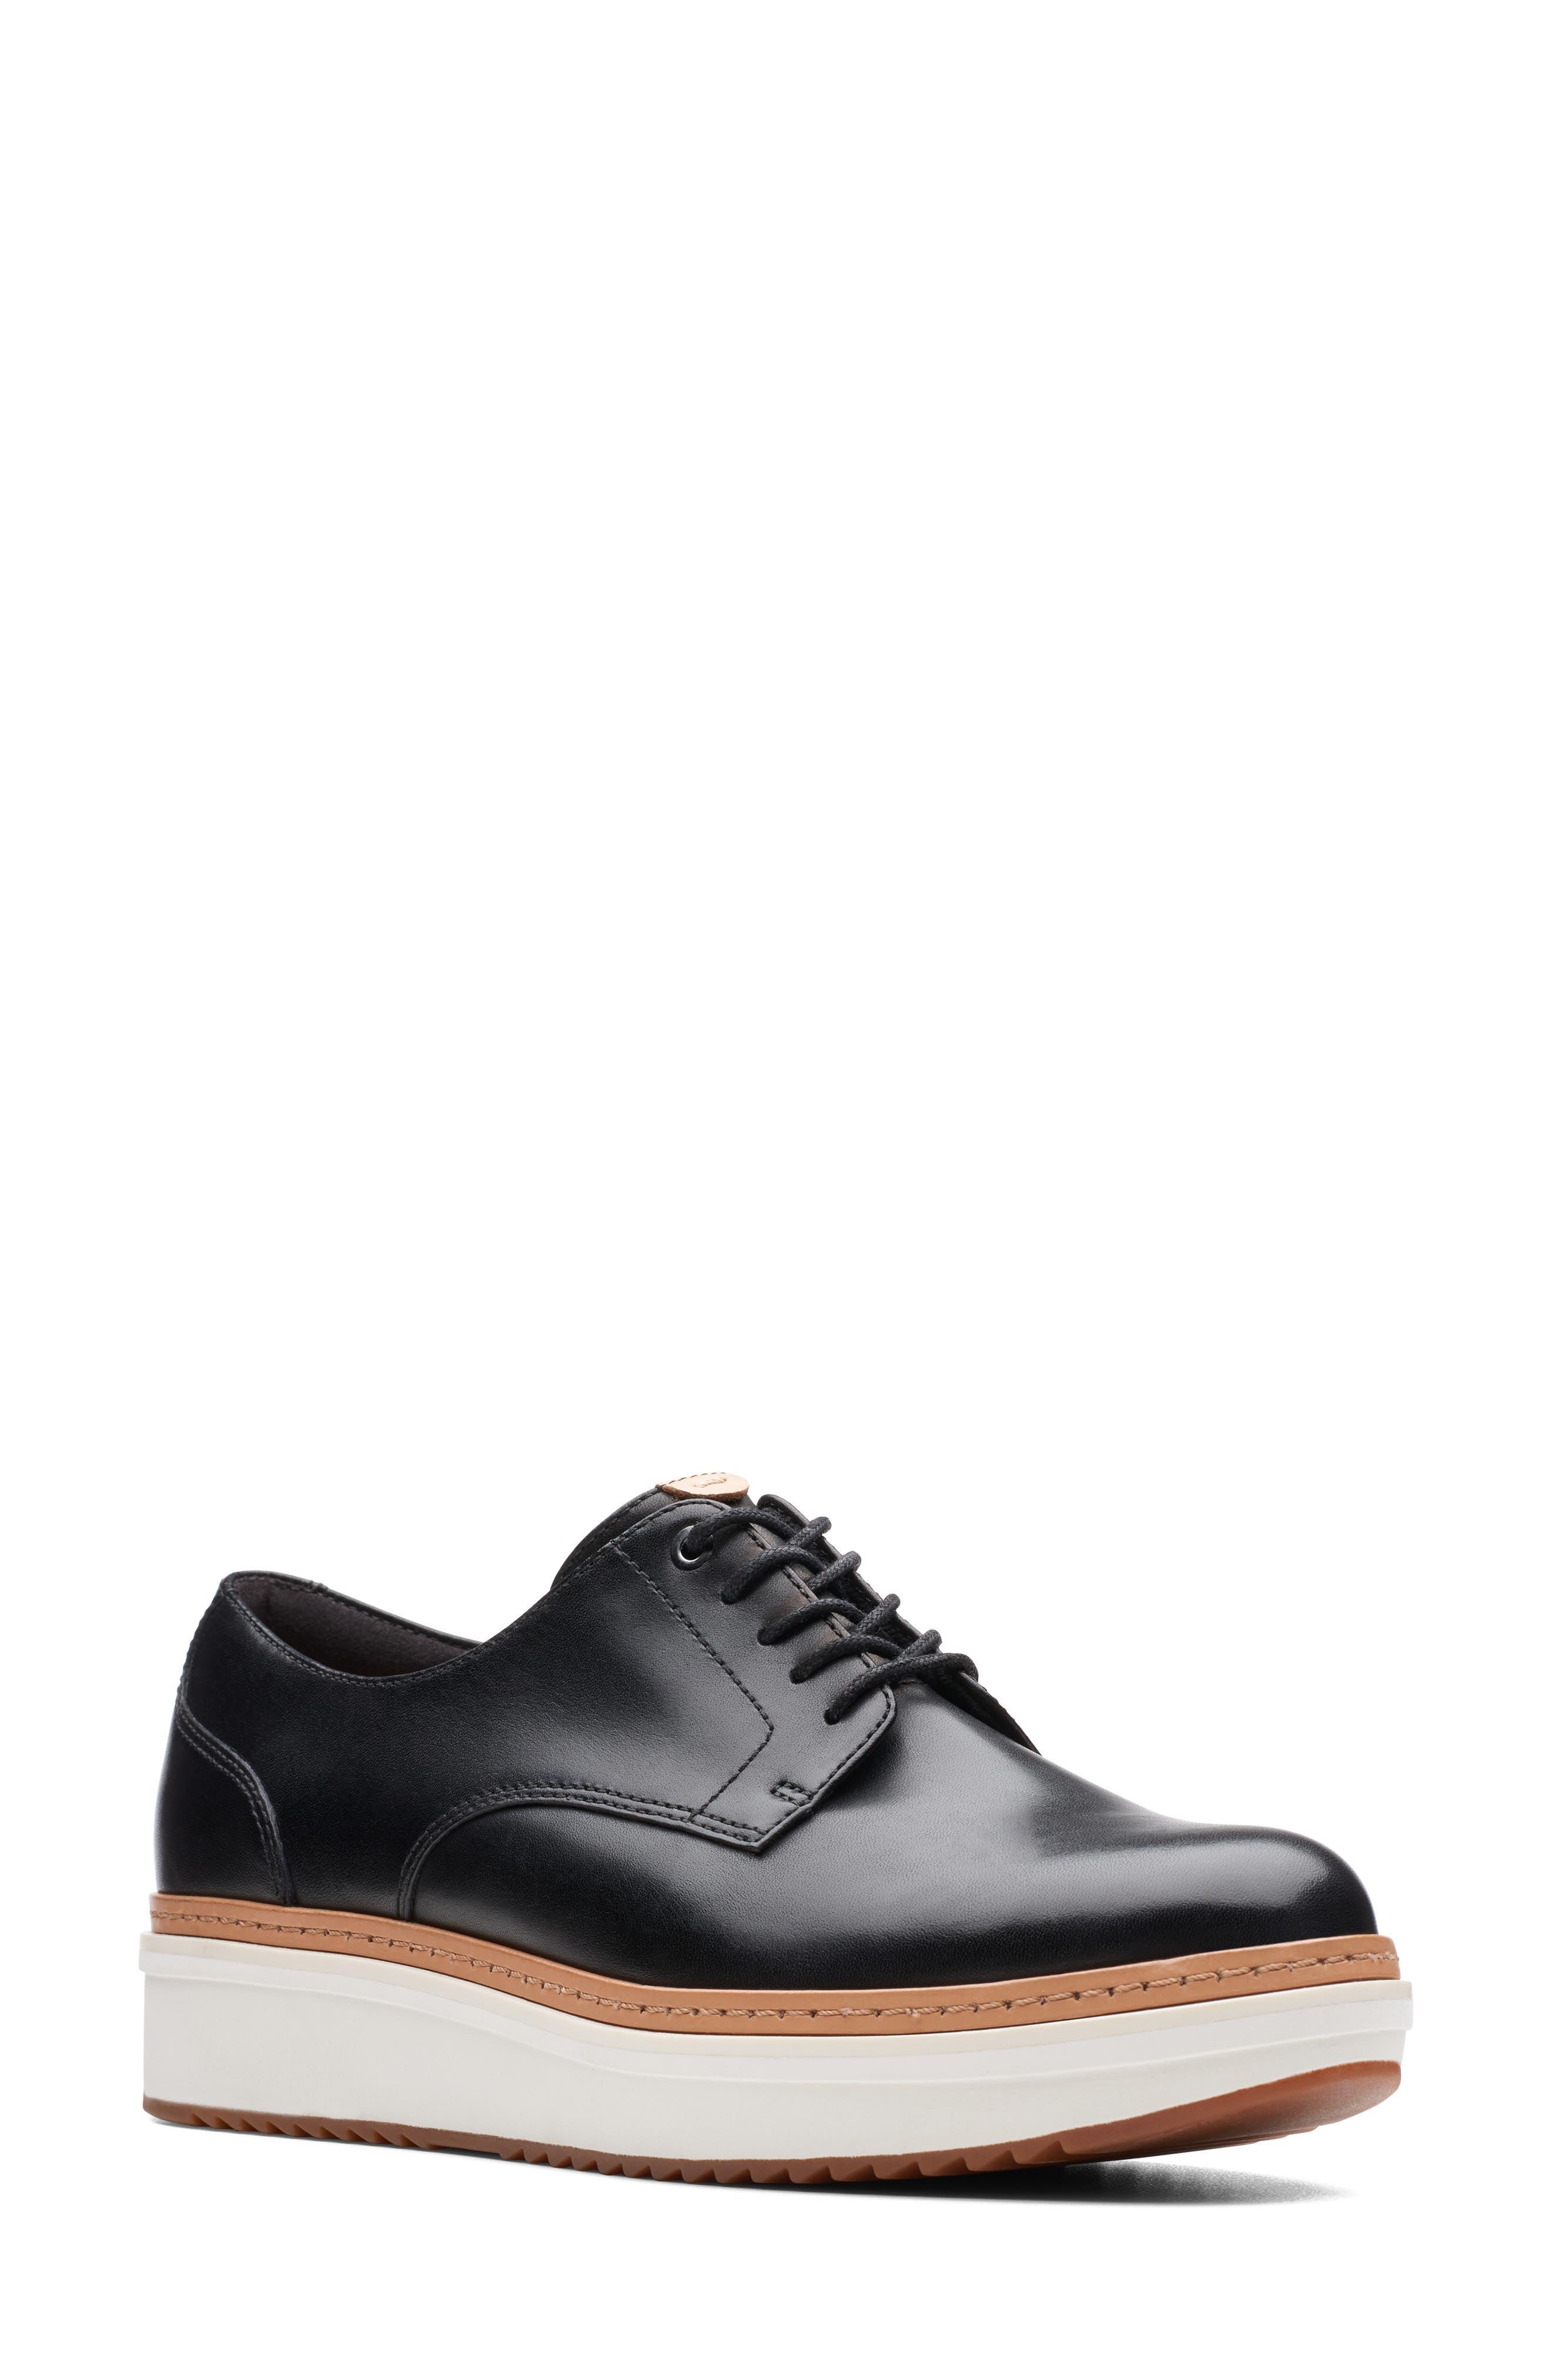 CLARKS<SUP>®</SUP> Teadale Rhea Platform Oxford, Main, color, BLACK LEATHER